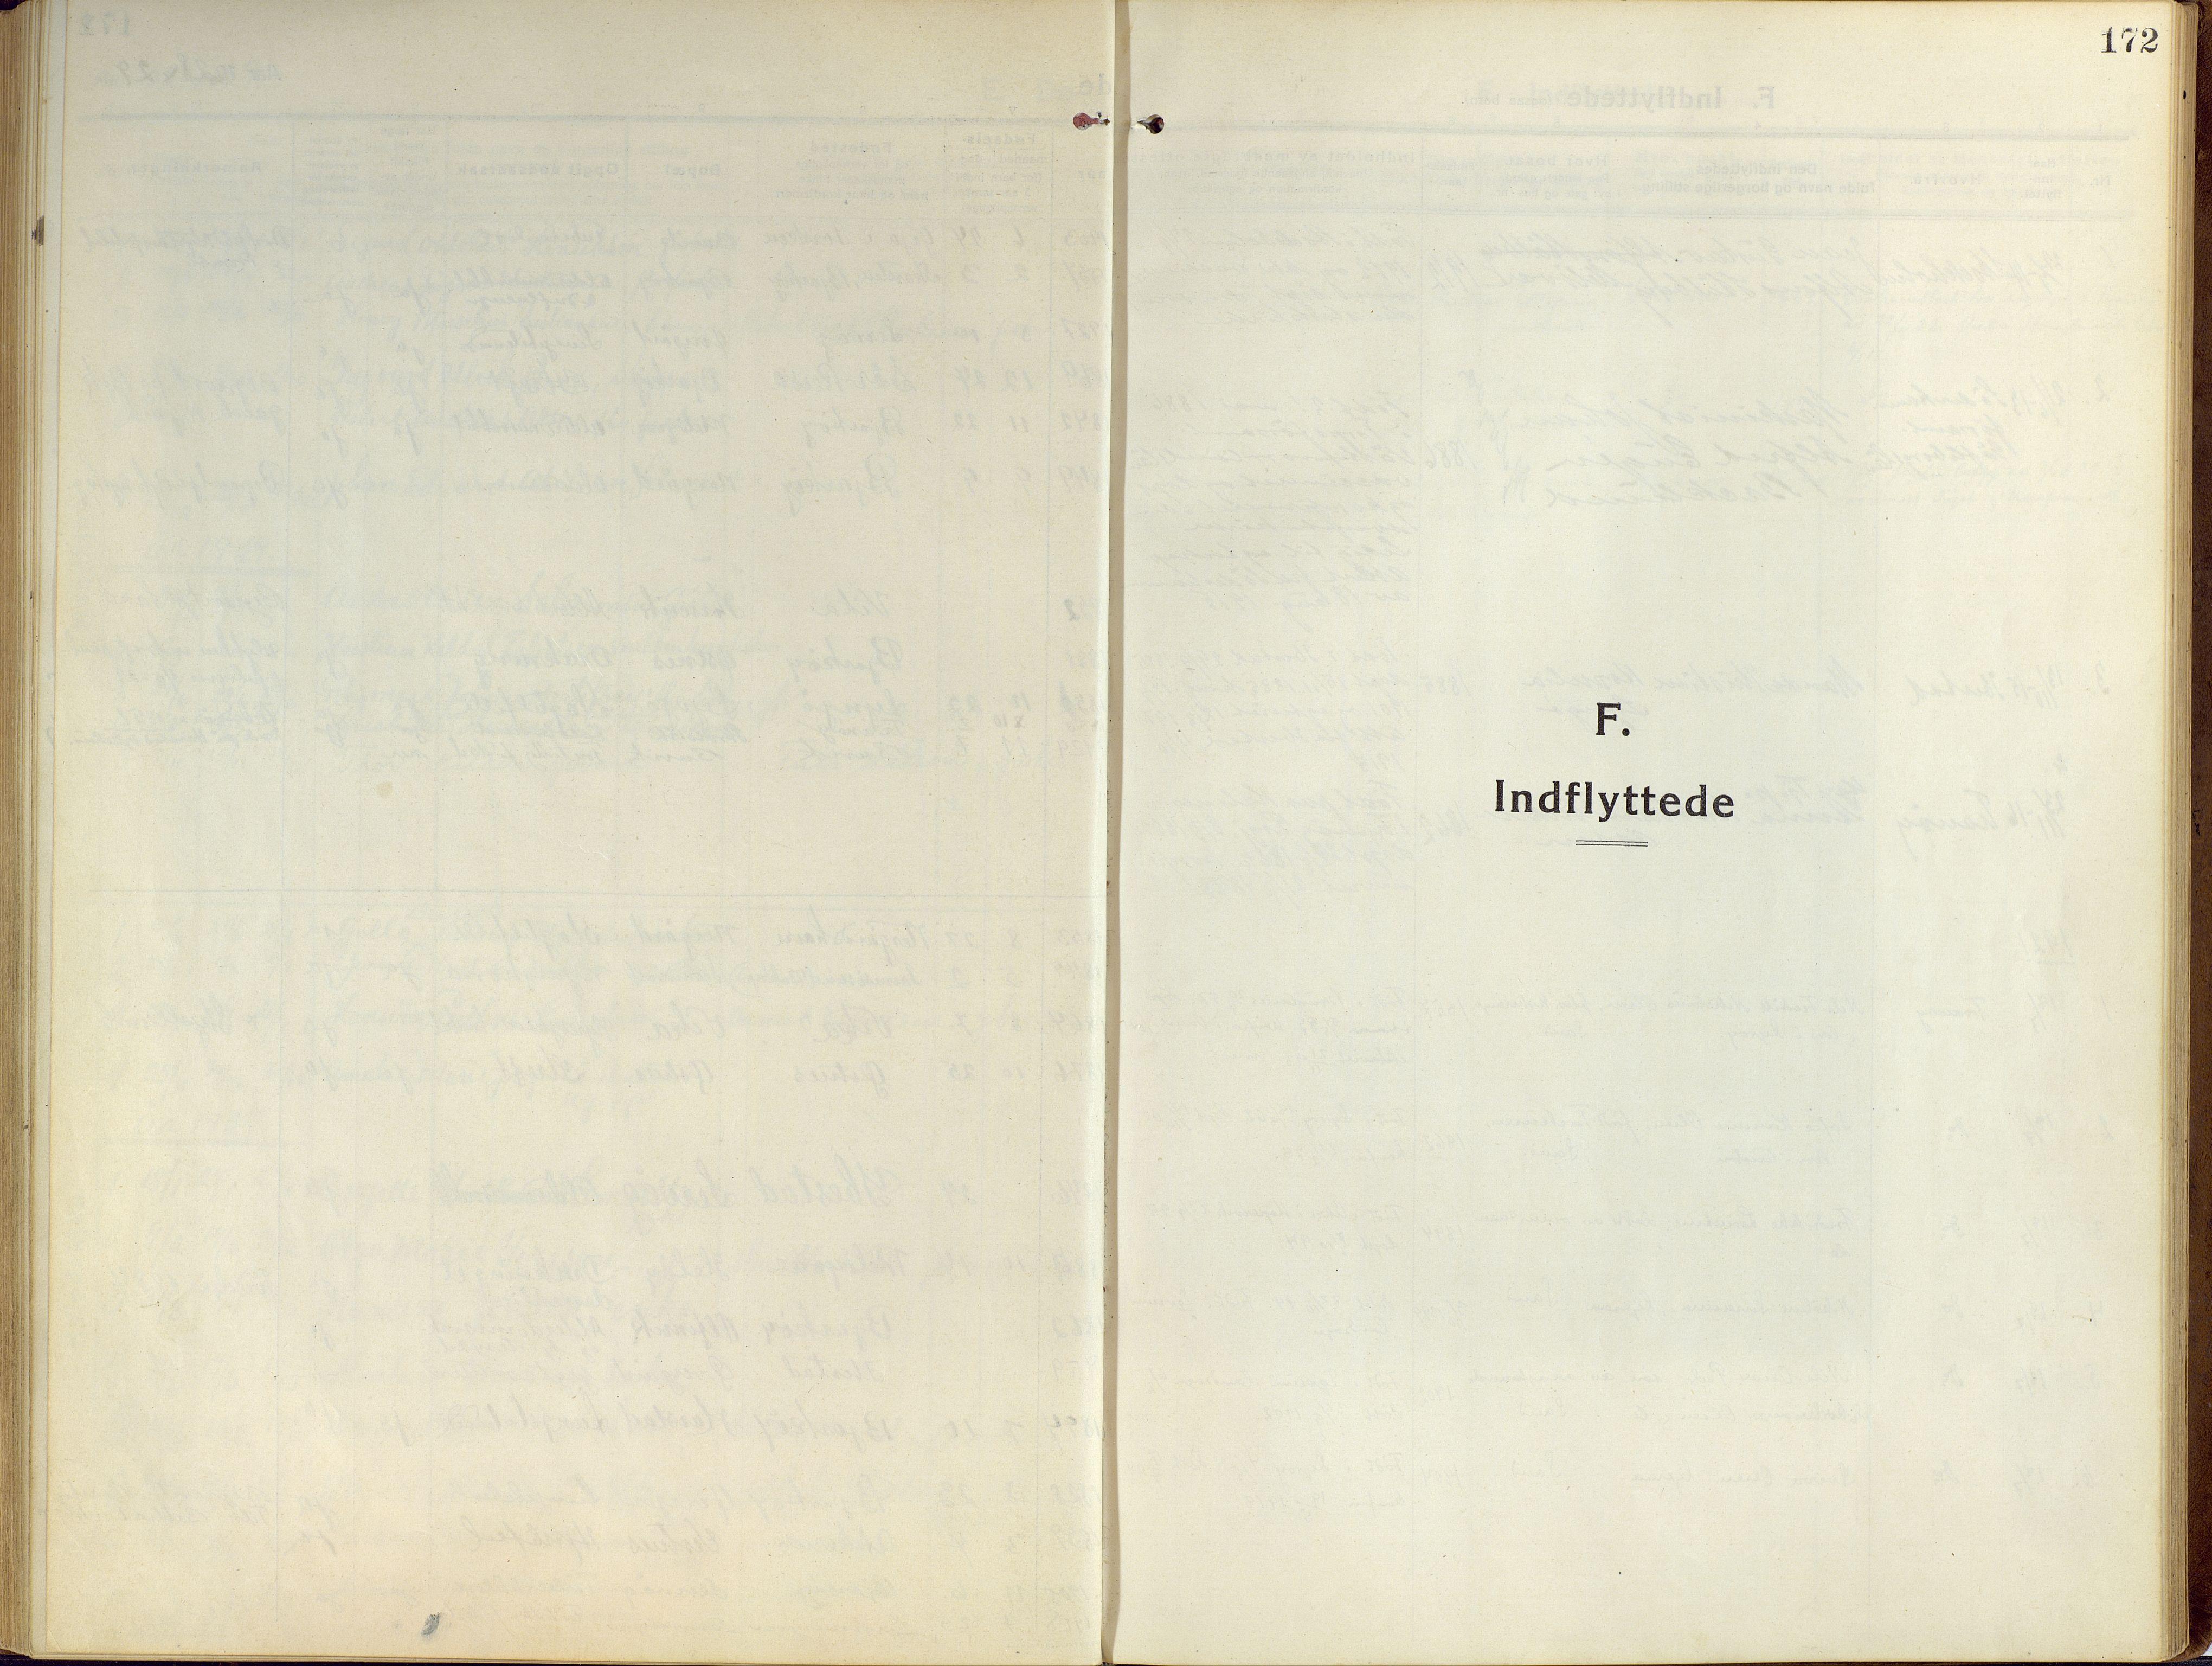 SATØ, Sand/Bjarkøy sokneprestkontor, I/Ia/Iaa/L0006kirke: Ministerialbok nr. 6, 1915-1929, s. 172